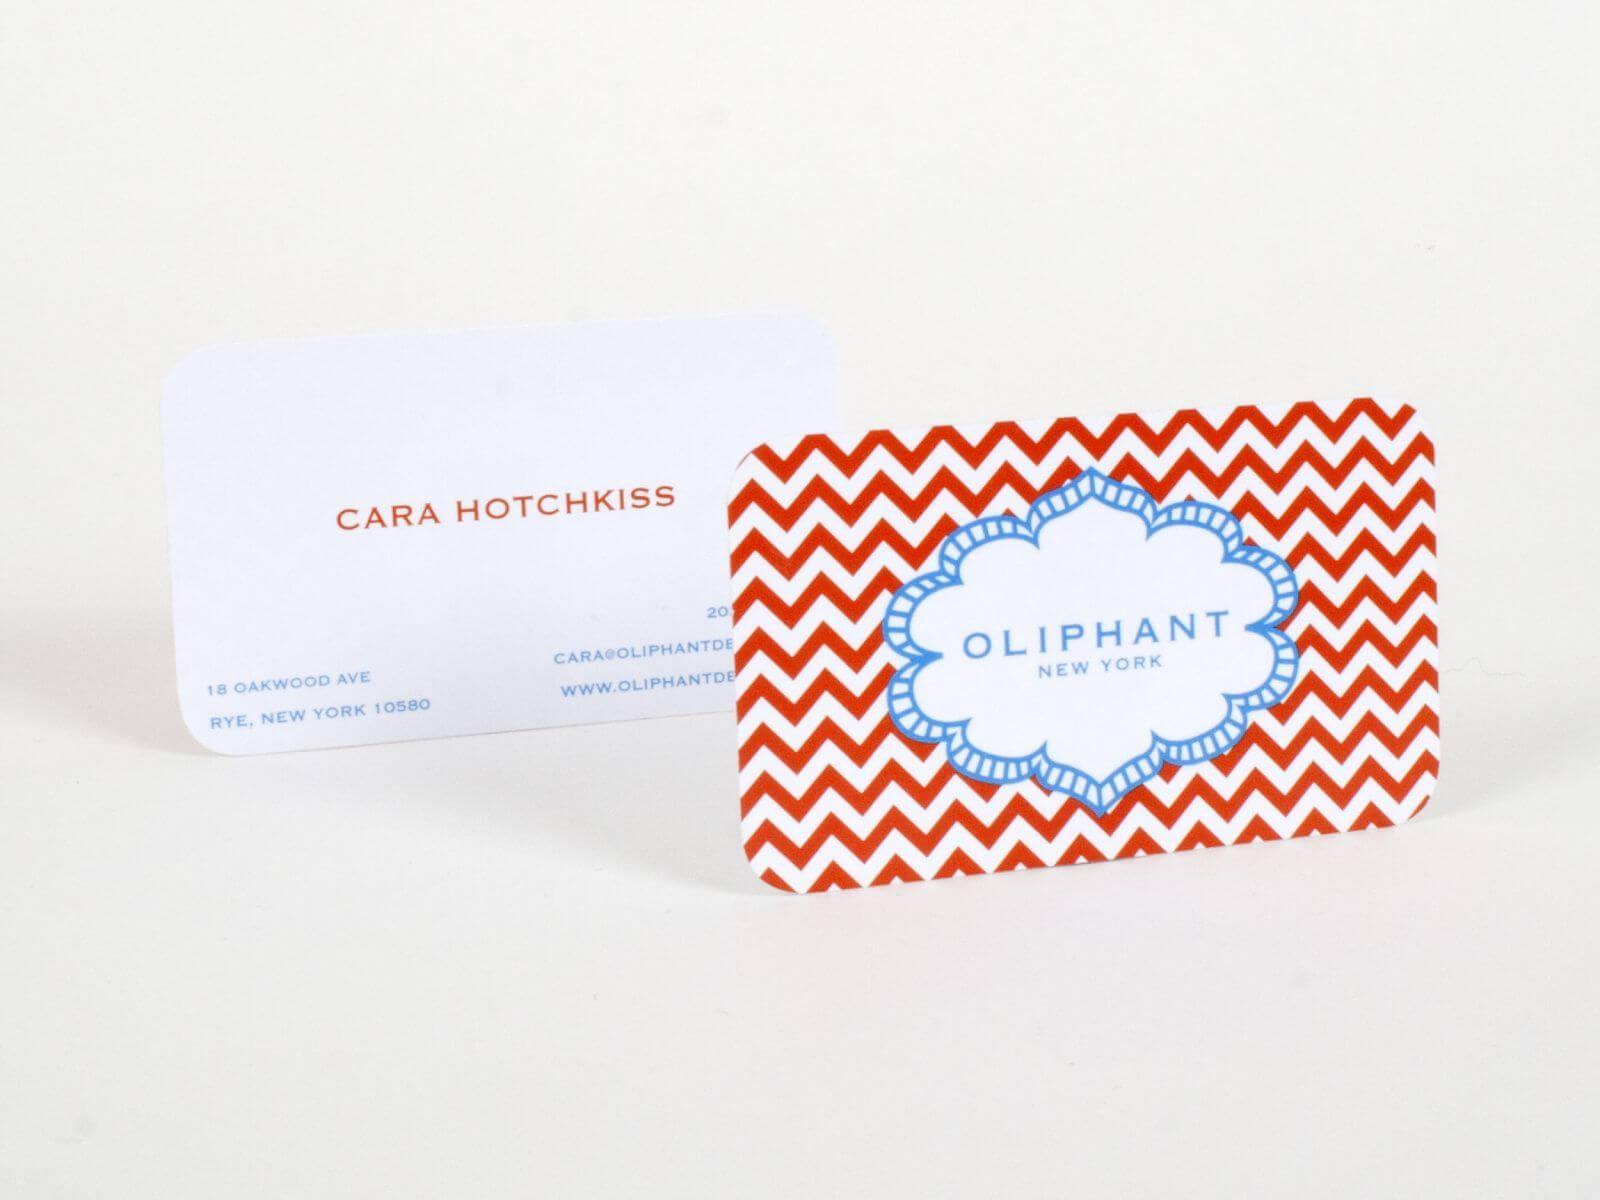 Elegant Print Business Cards Fedex Kinkos | Business Card Within Kinkos Business Card Template